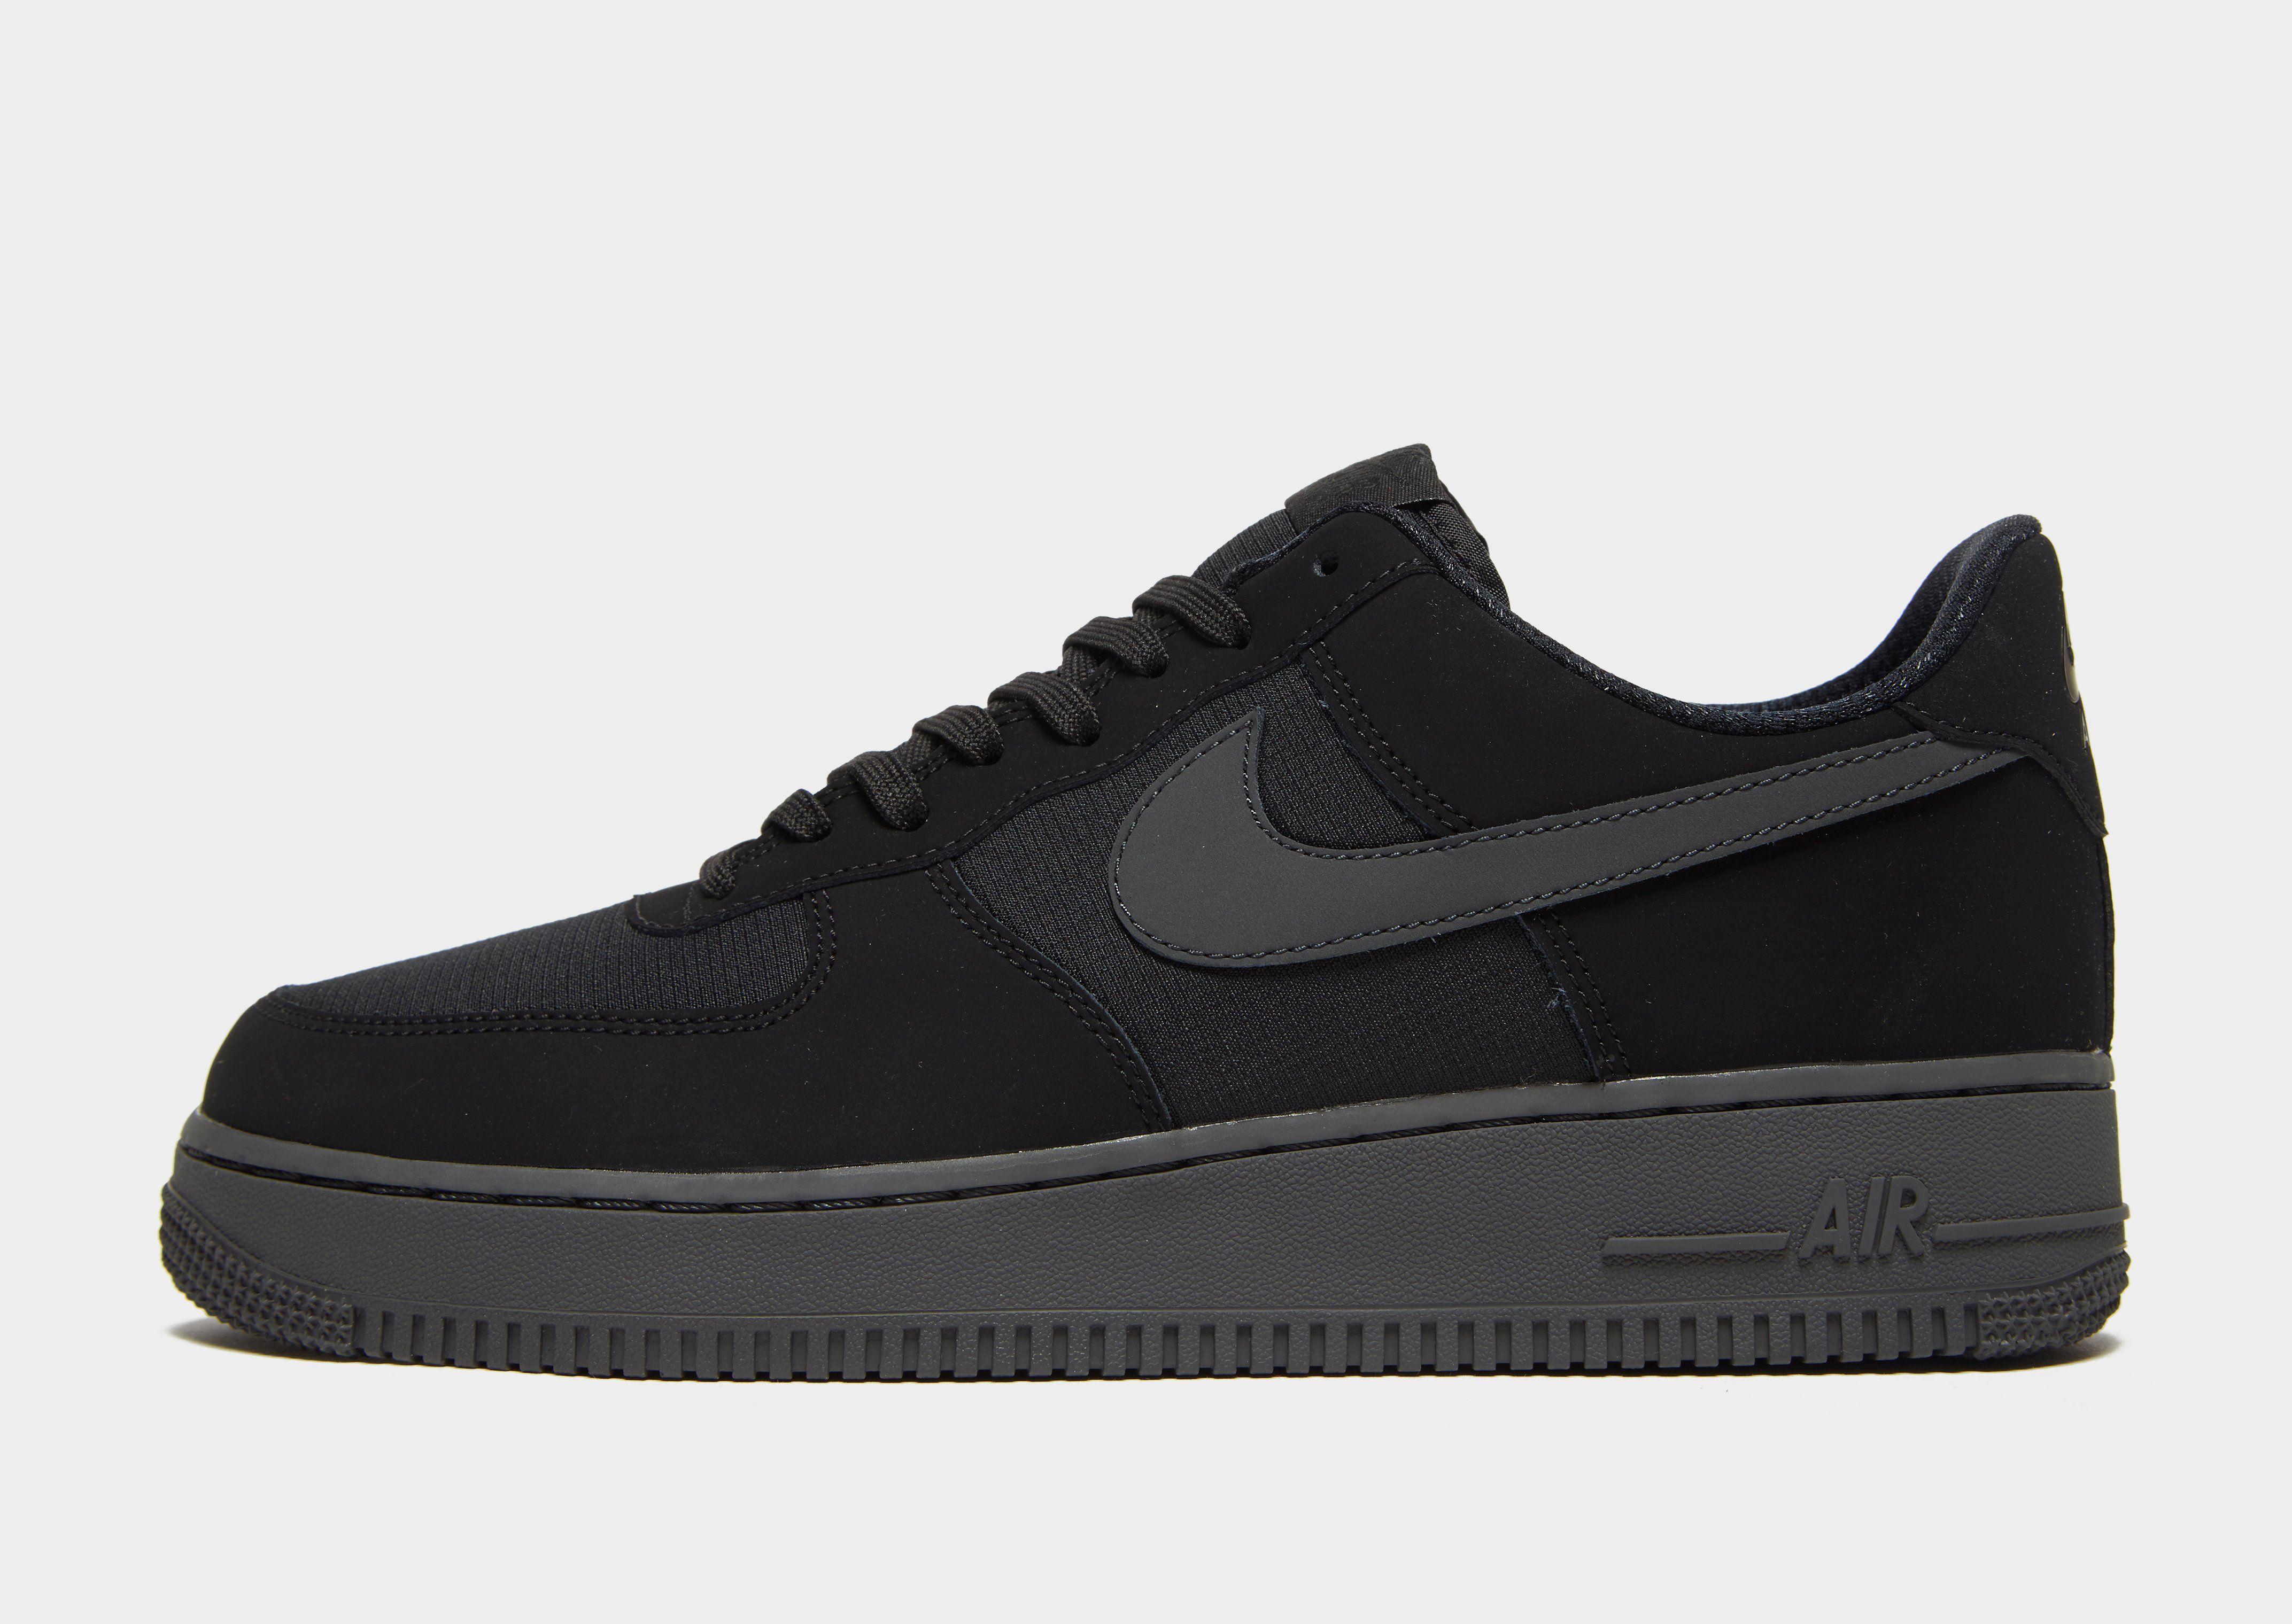 Nike Air Force 1 Essential Low